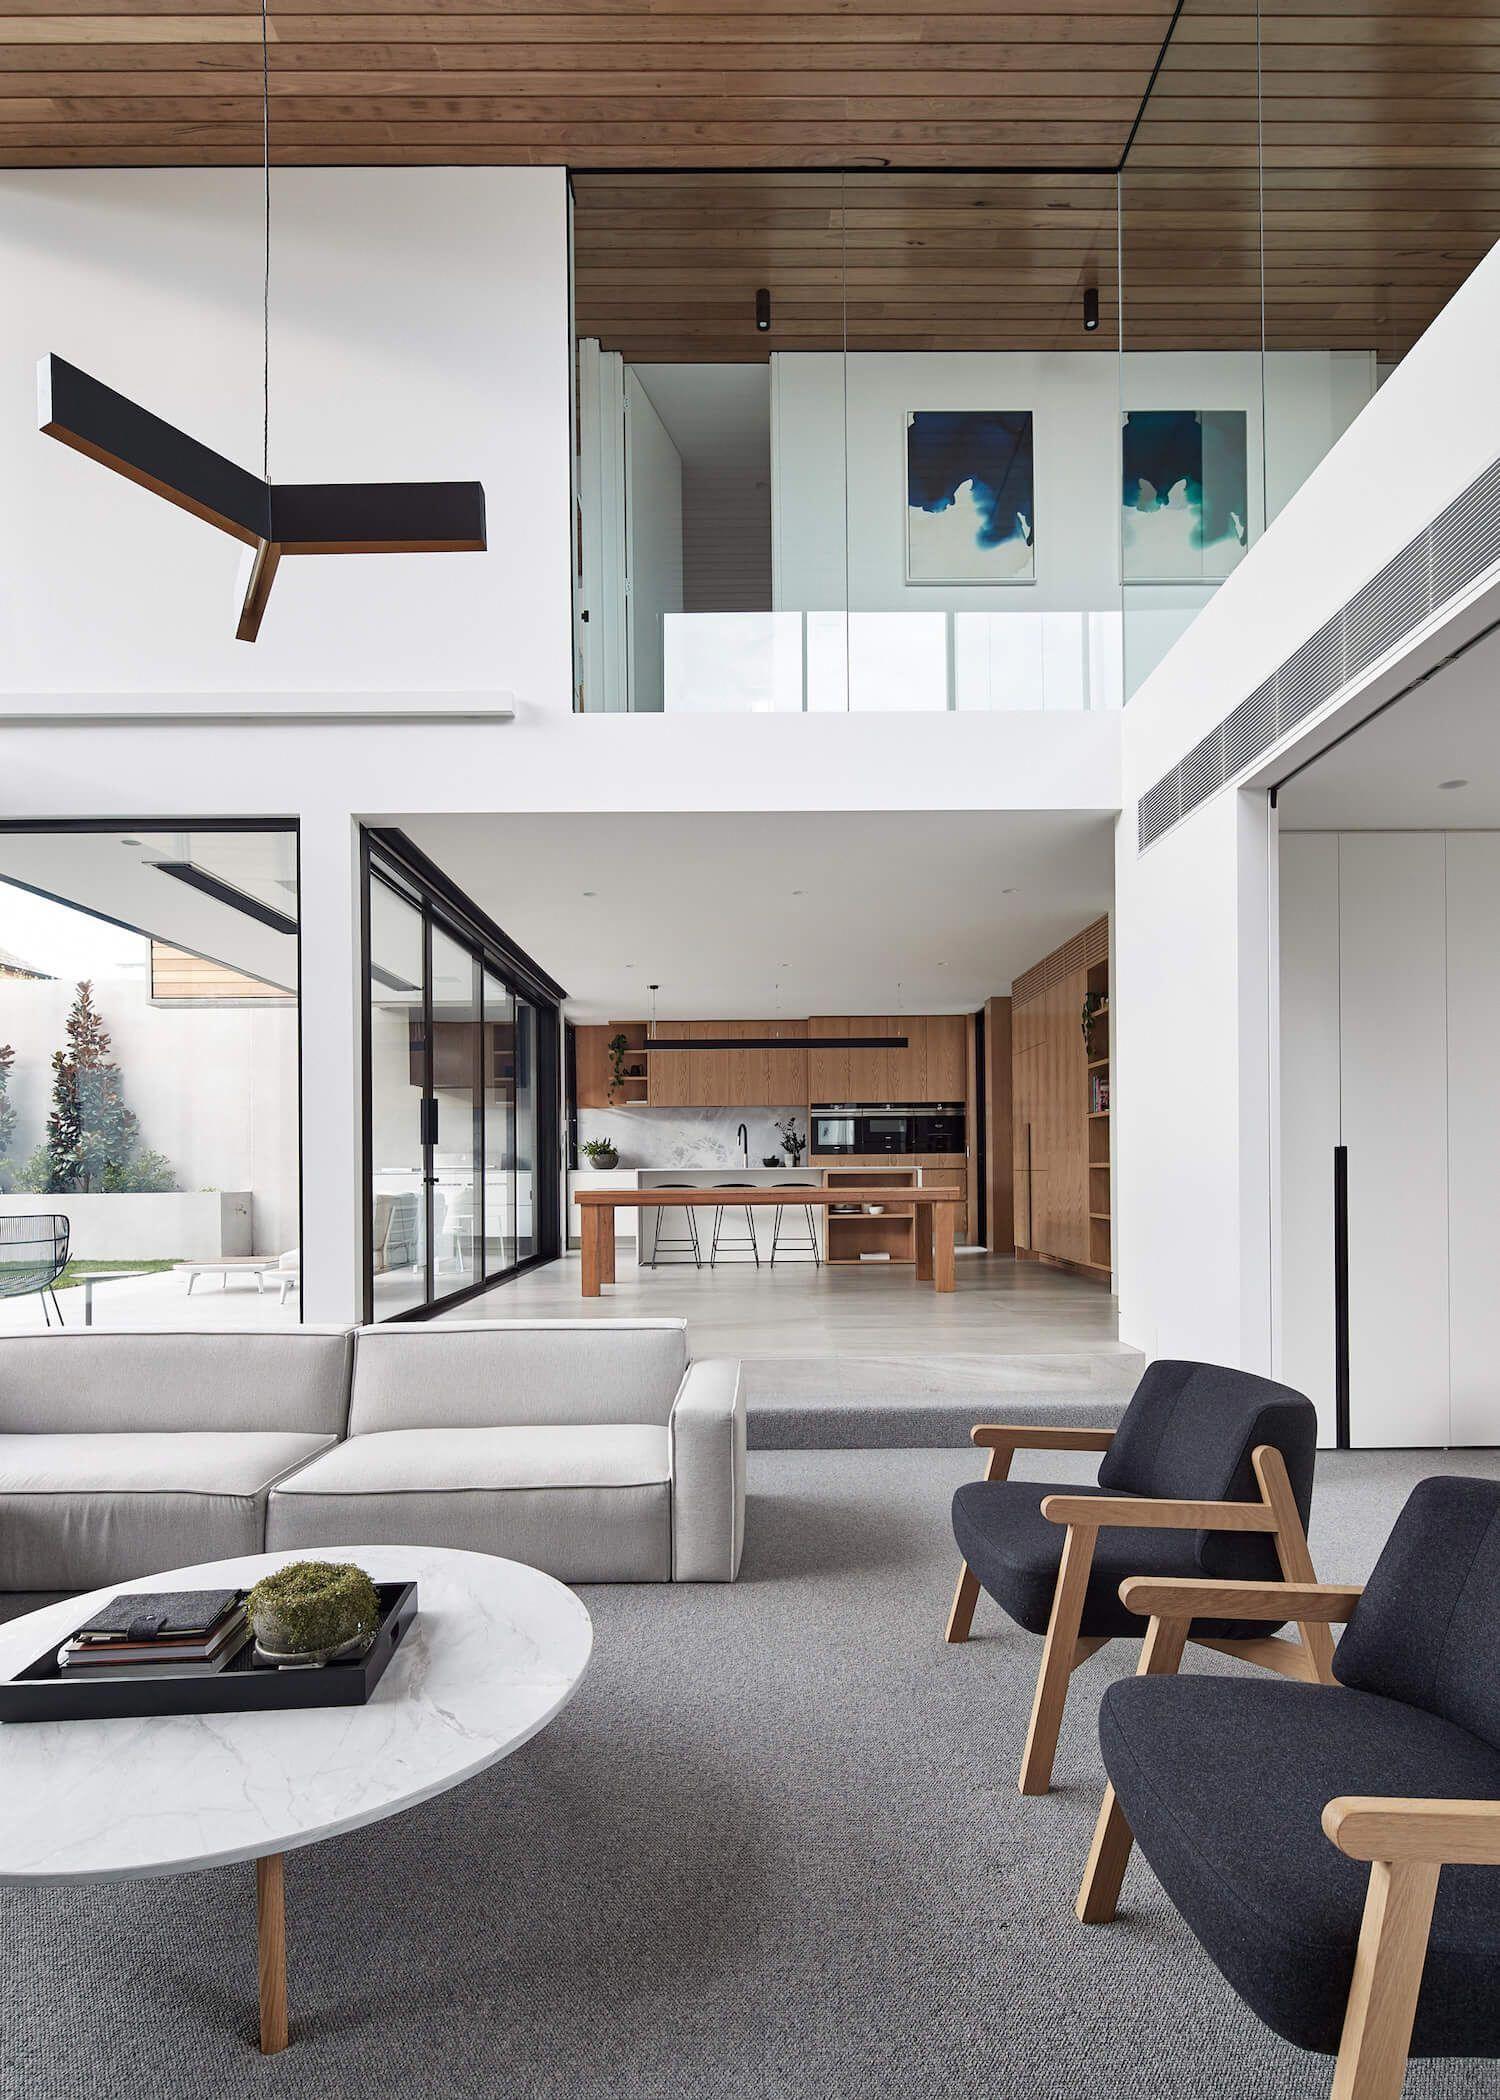 Design fgr architects photography peter bennetts sweet home make sweethomemake also rh pinterest